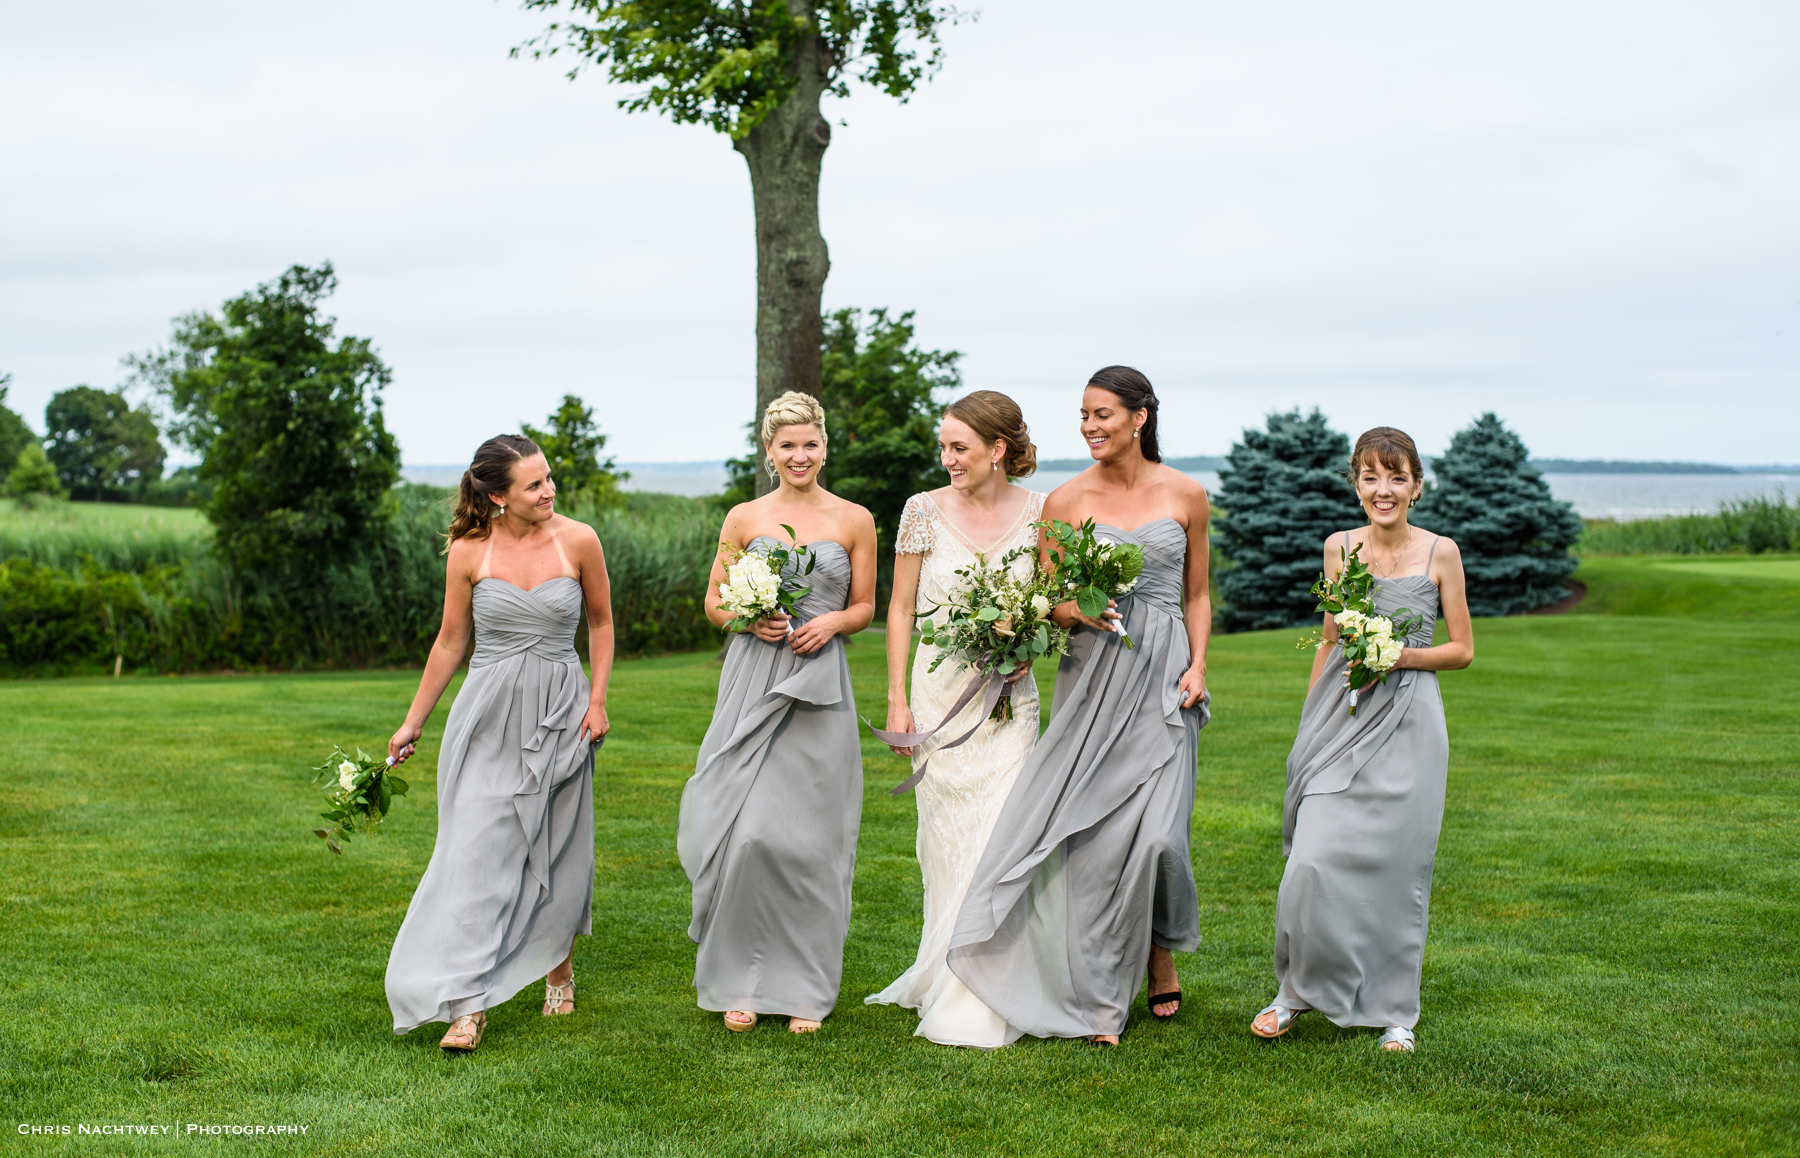 photos-wedding-quidnessett-country-club-ri-chris-nachtwey-photography-2018-32.jpg